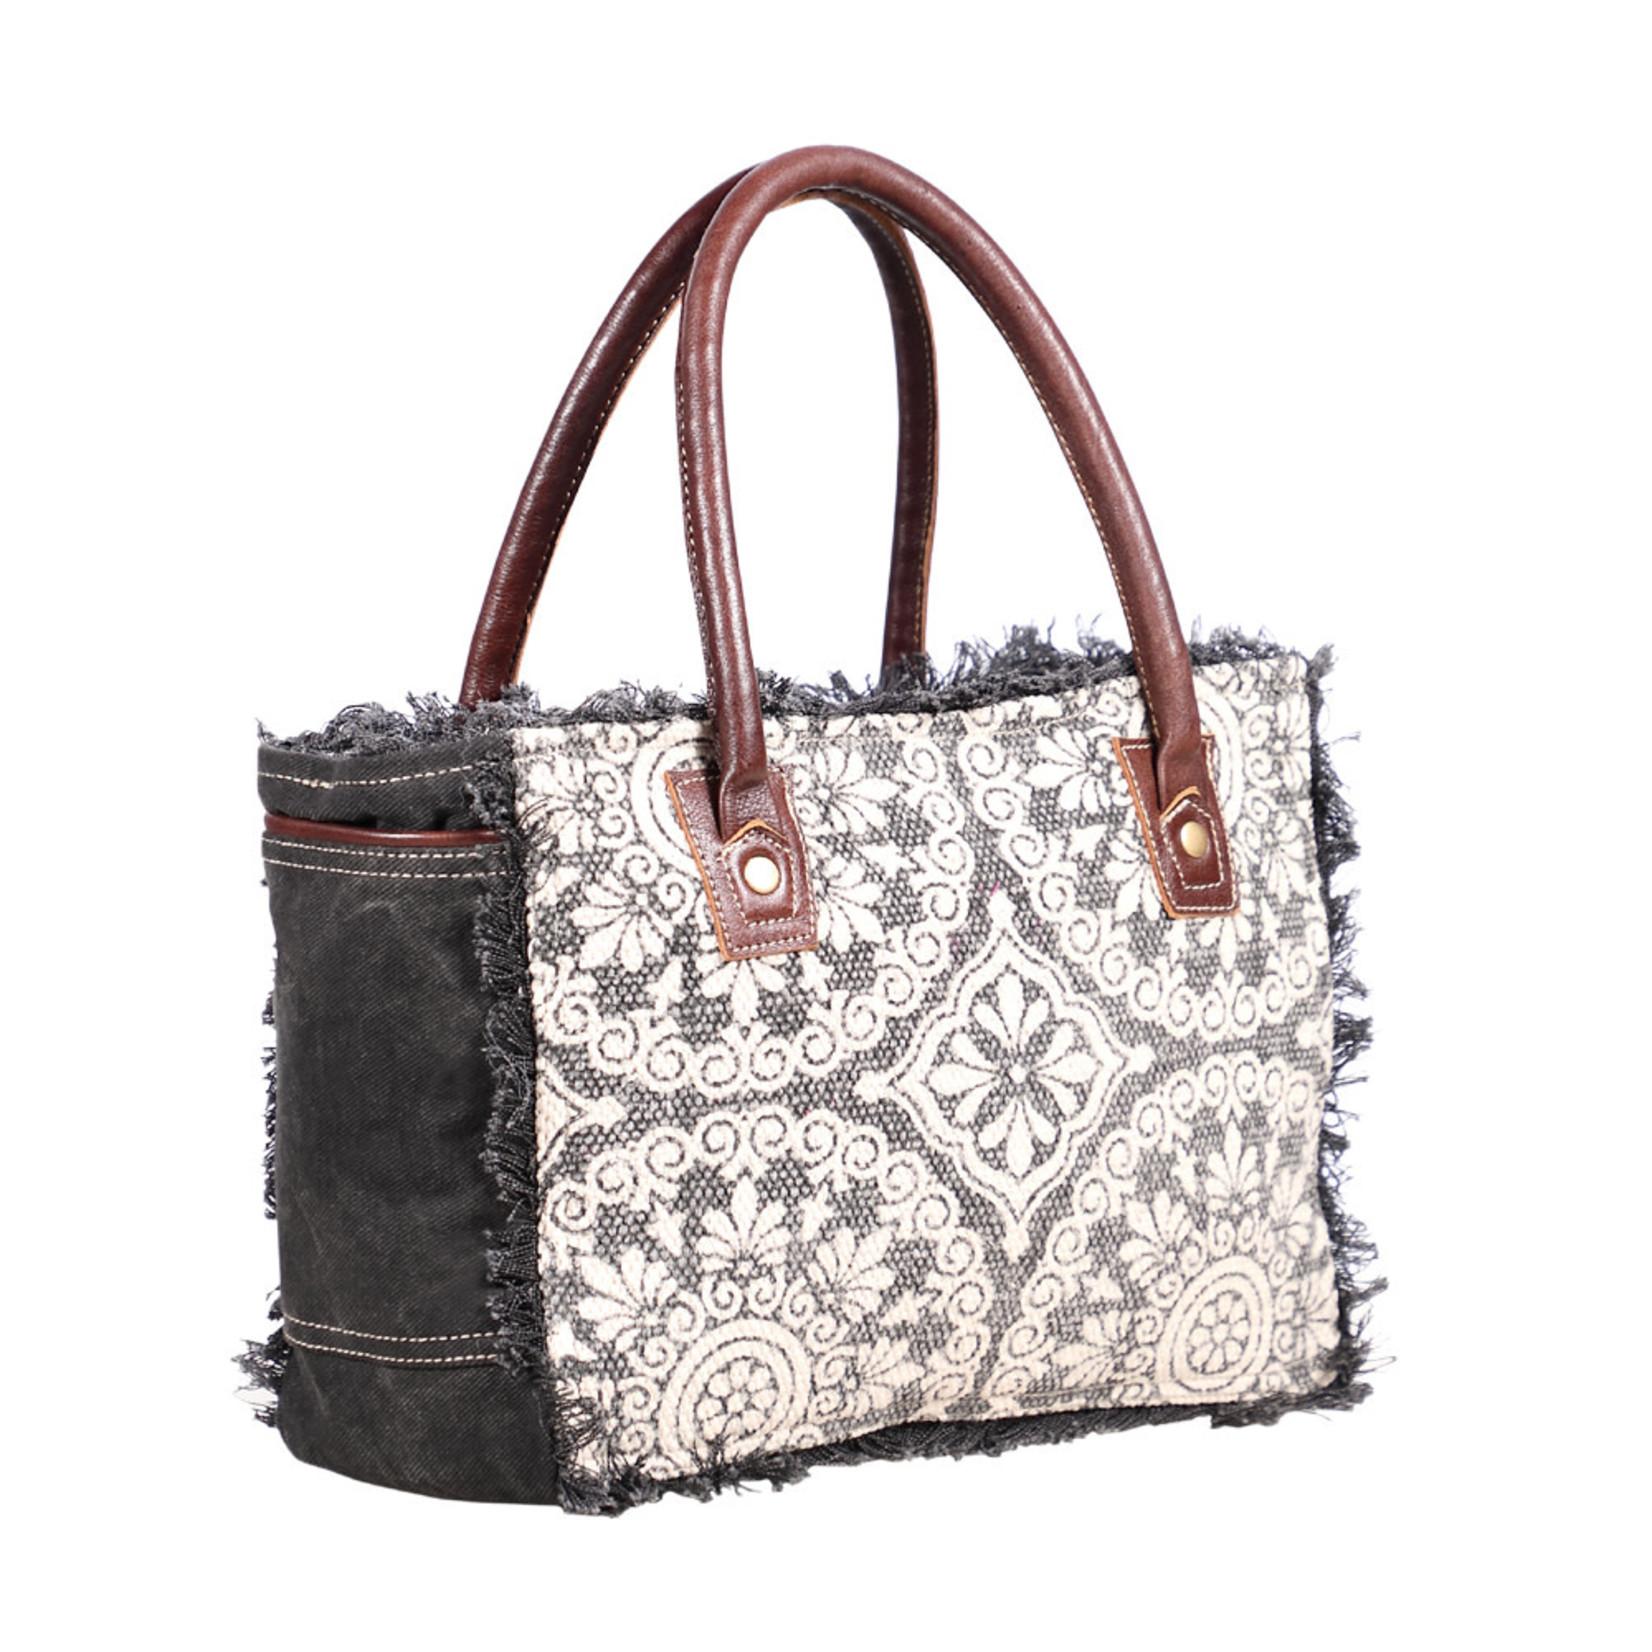 Myra Bags S-1884 Yarny Small Bag